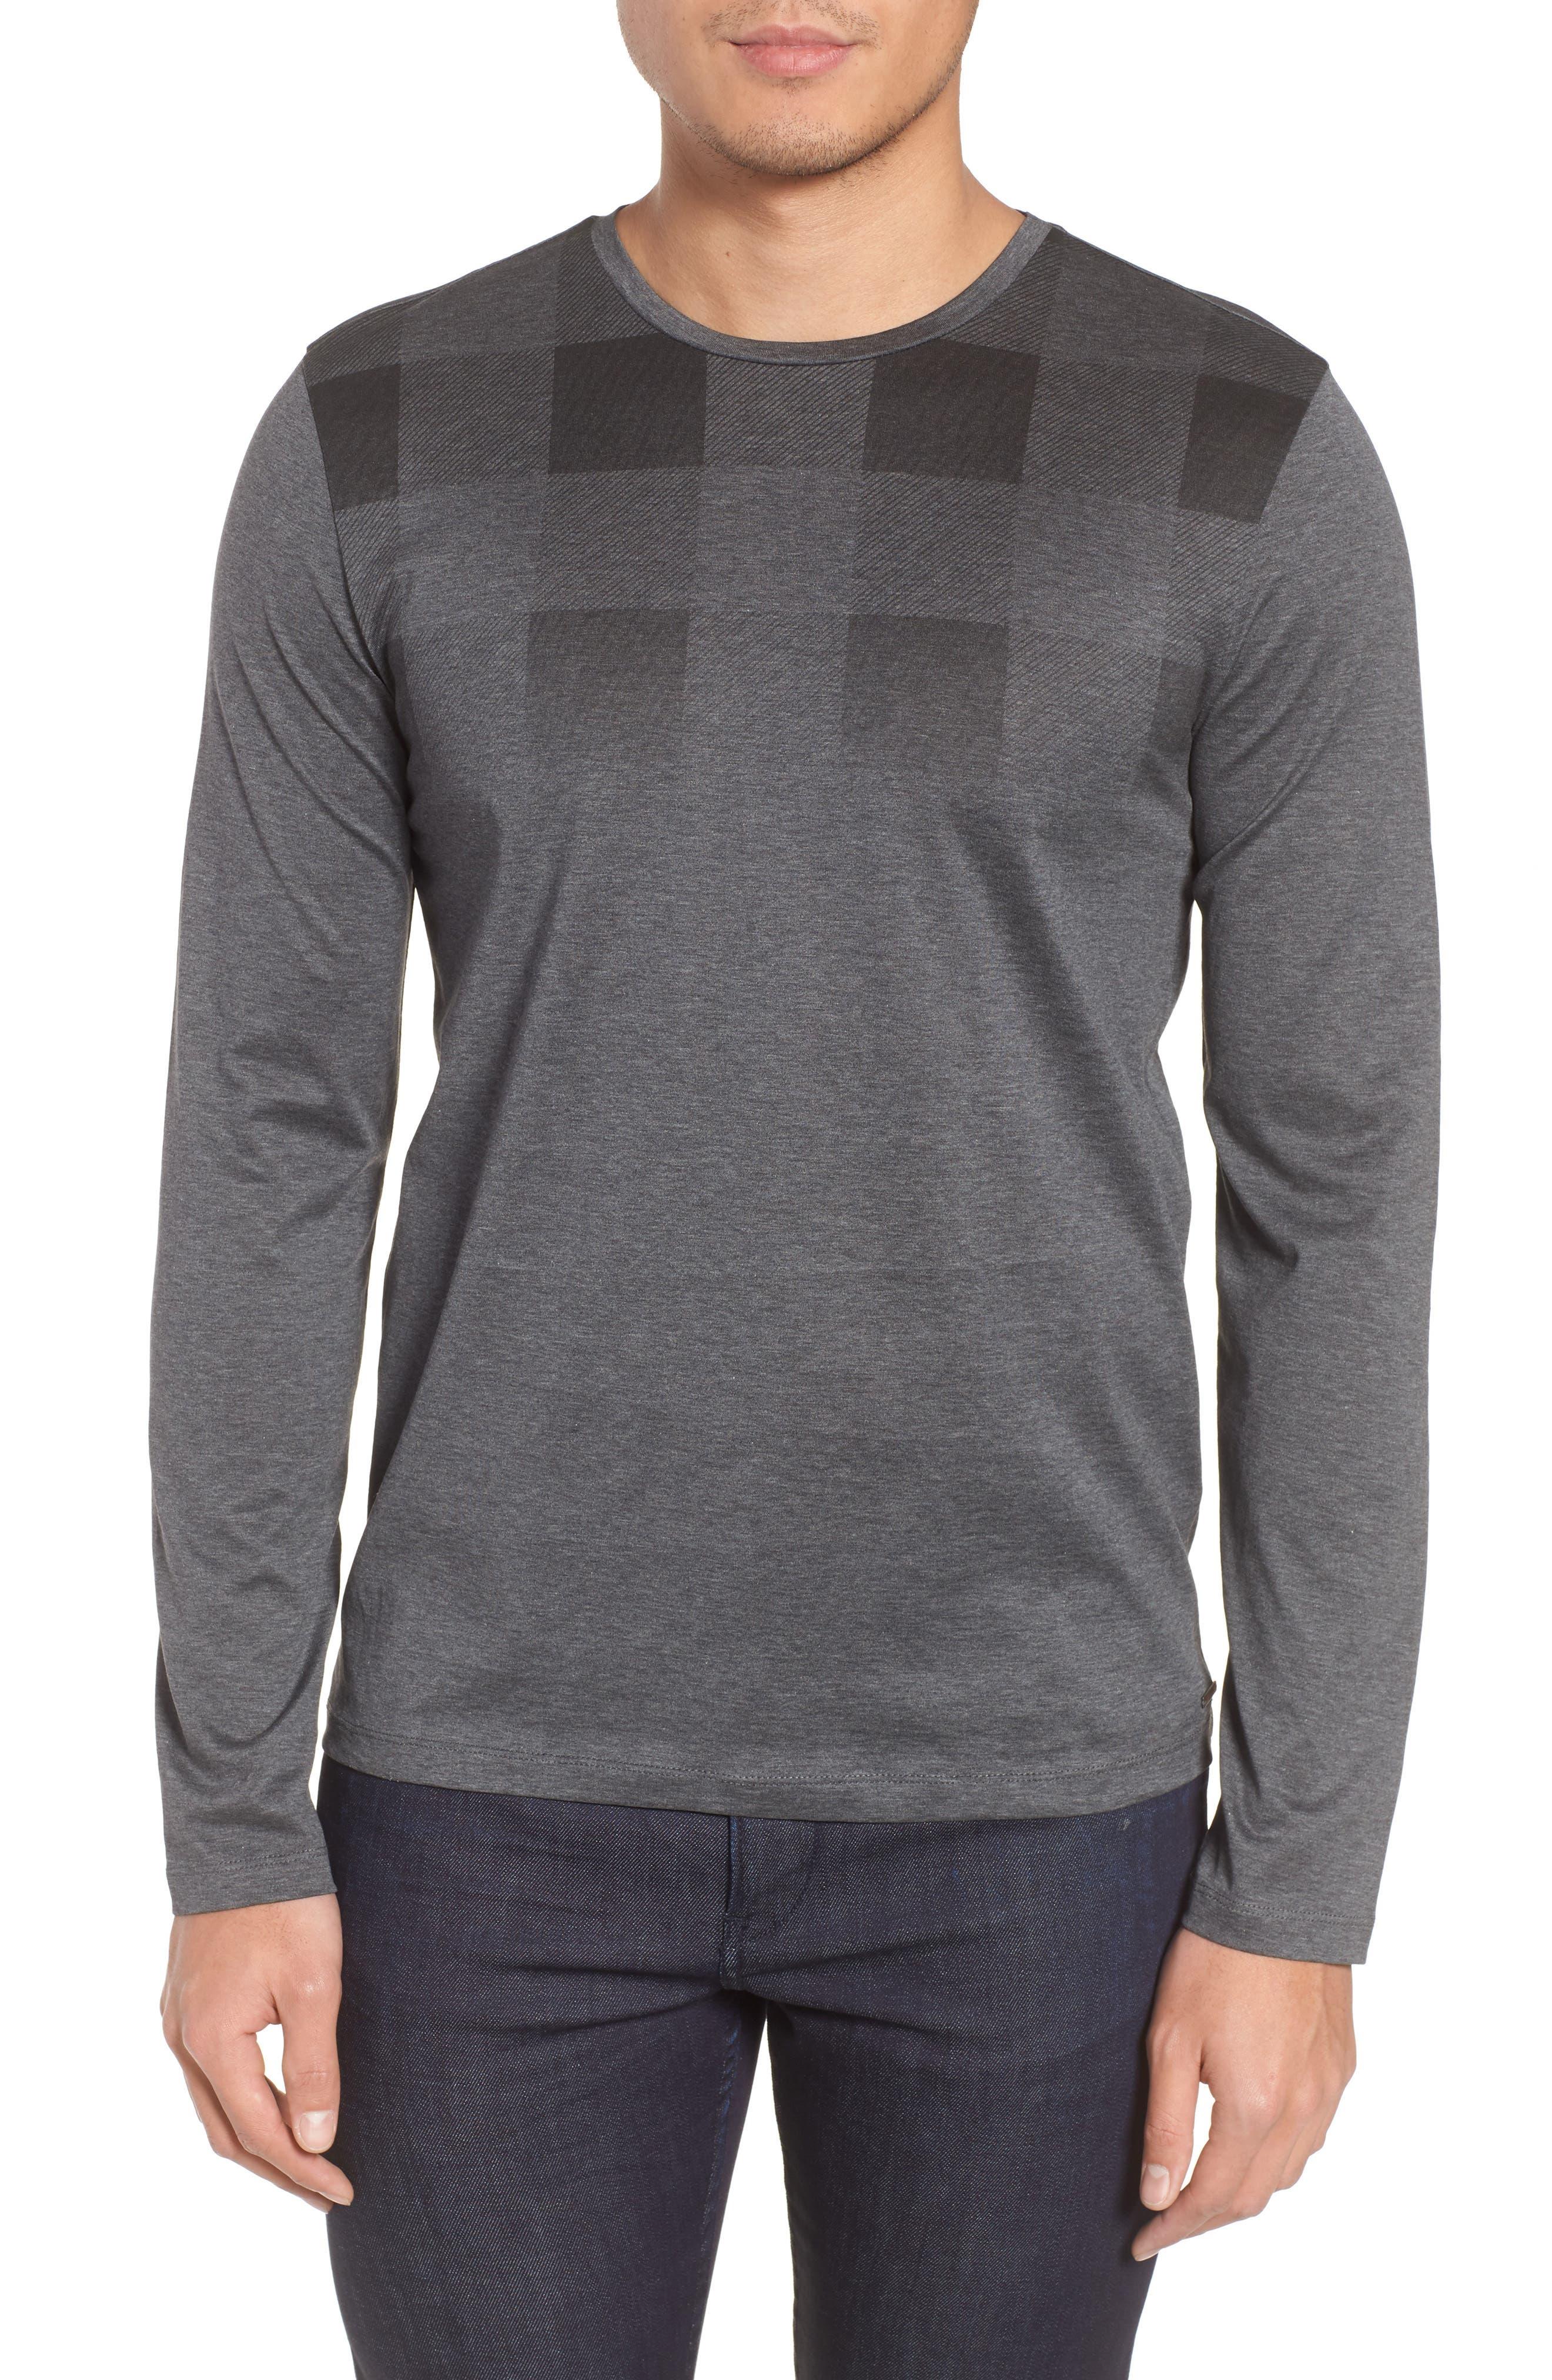 Tenison Slim Fit Ombre Check Long Sleeve T-shirt,                         Main,                         color, 030